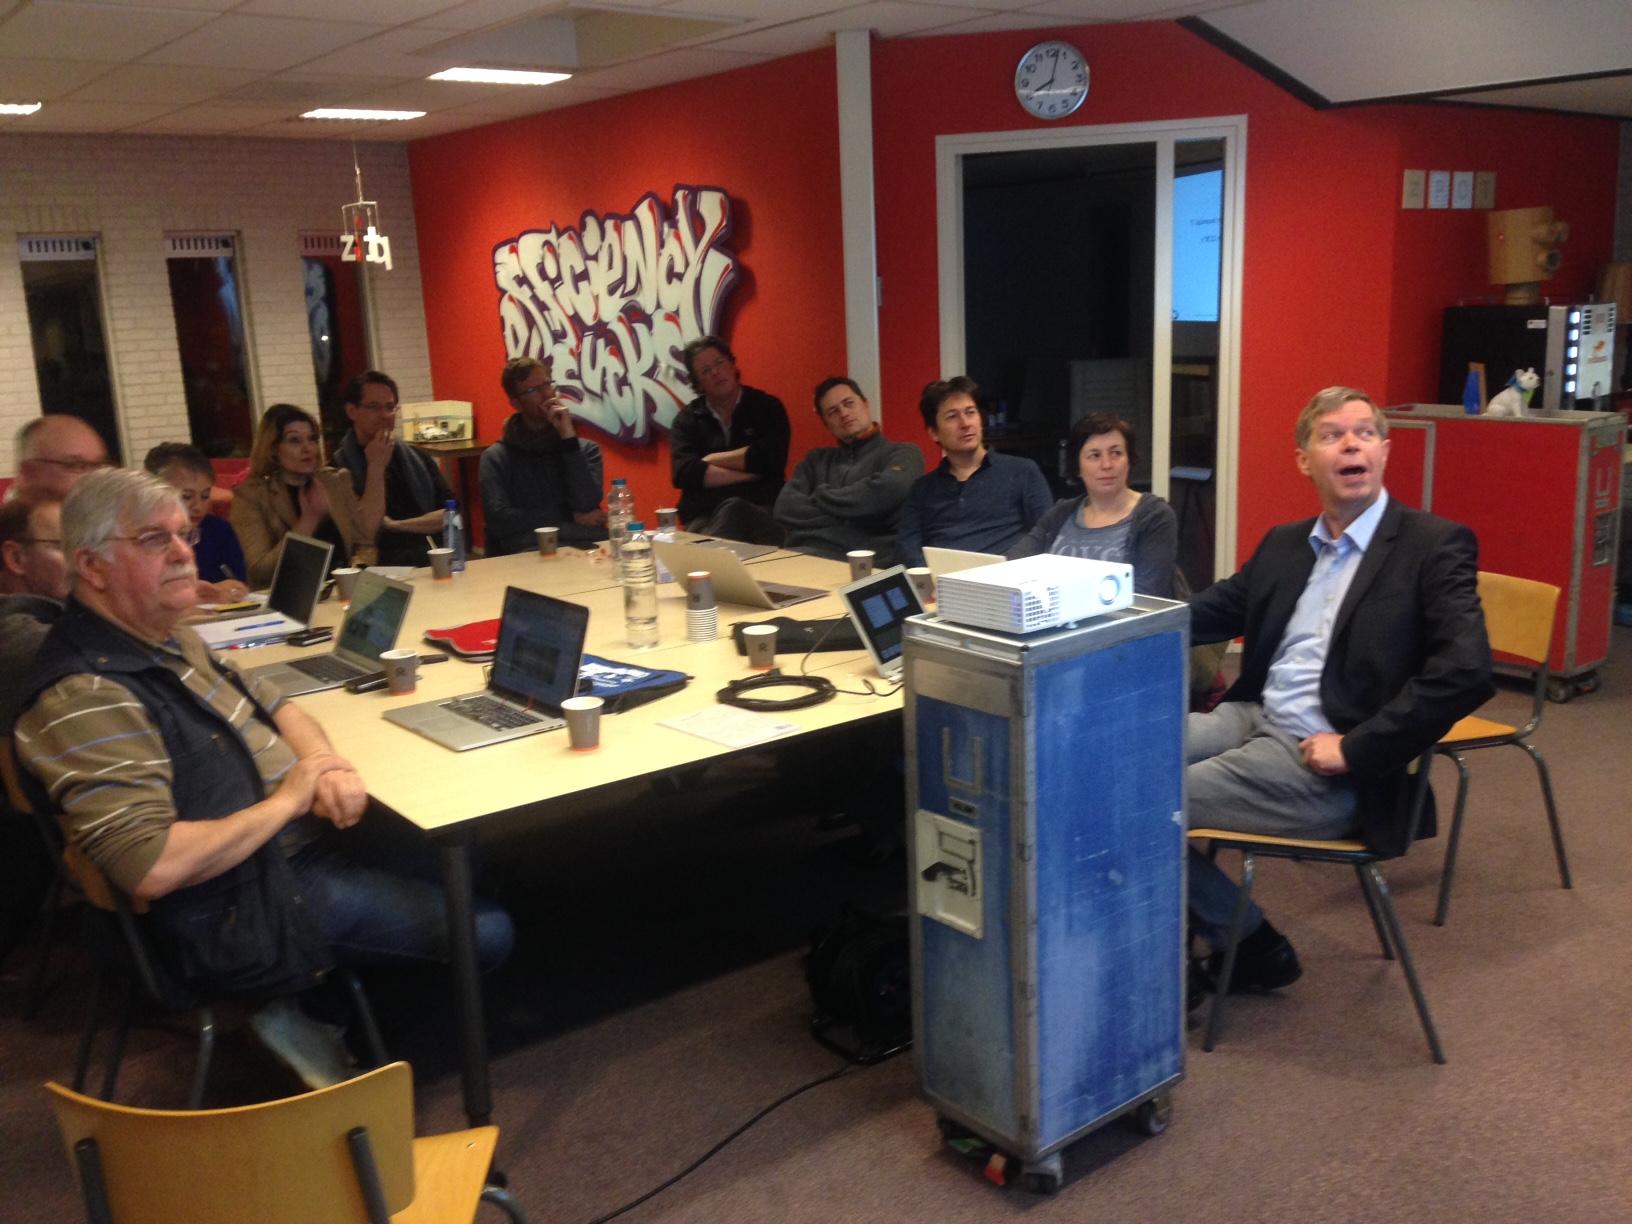 JUG030 Presentaite Seblod en andere CCKs door Niels Bons 09-02-2015